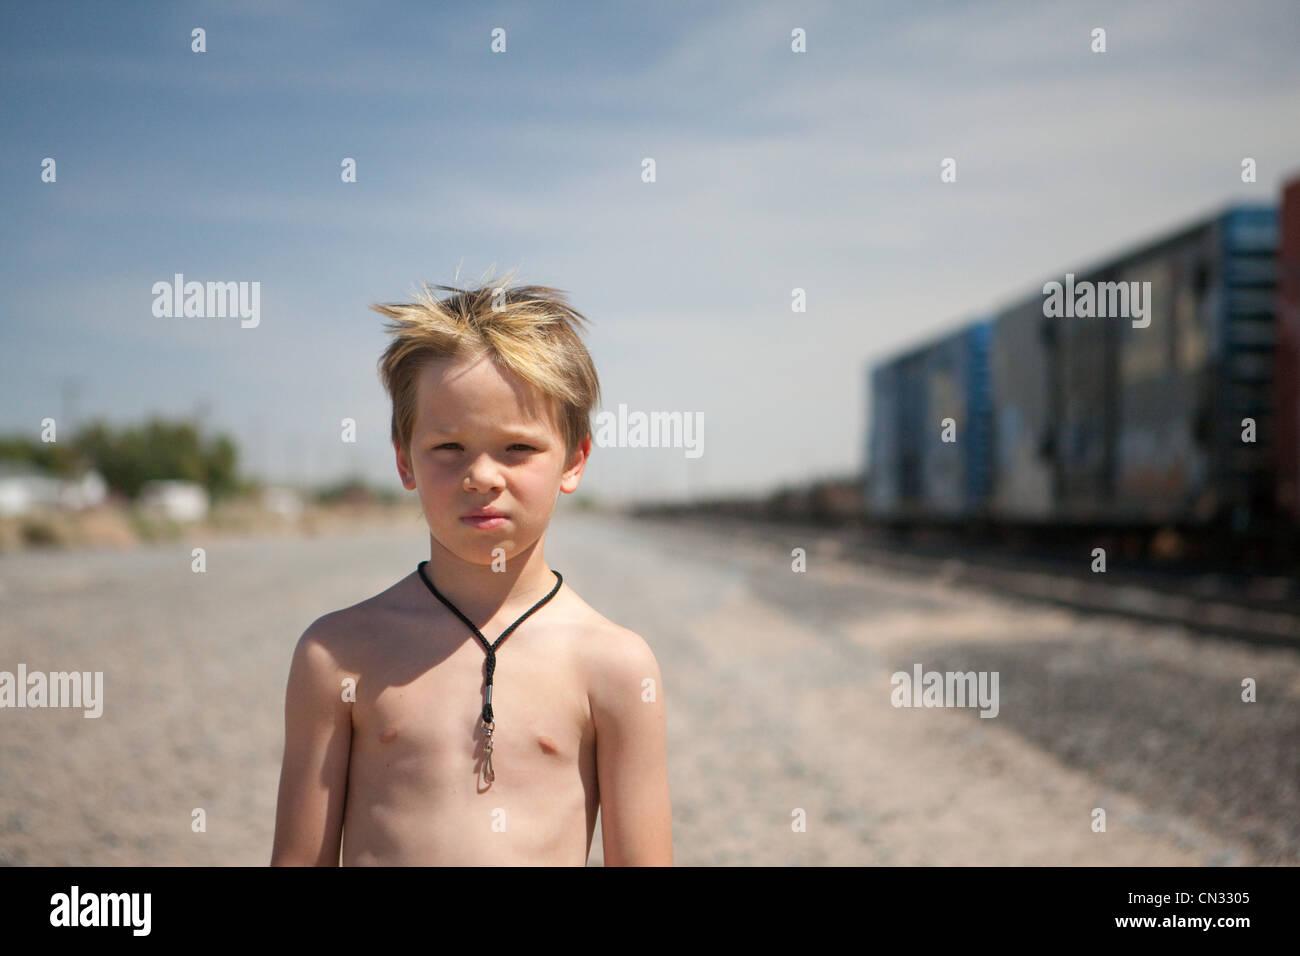 Boy by train tracks - Stock Image